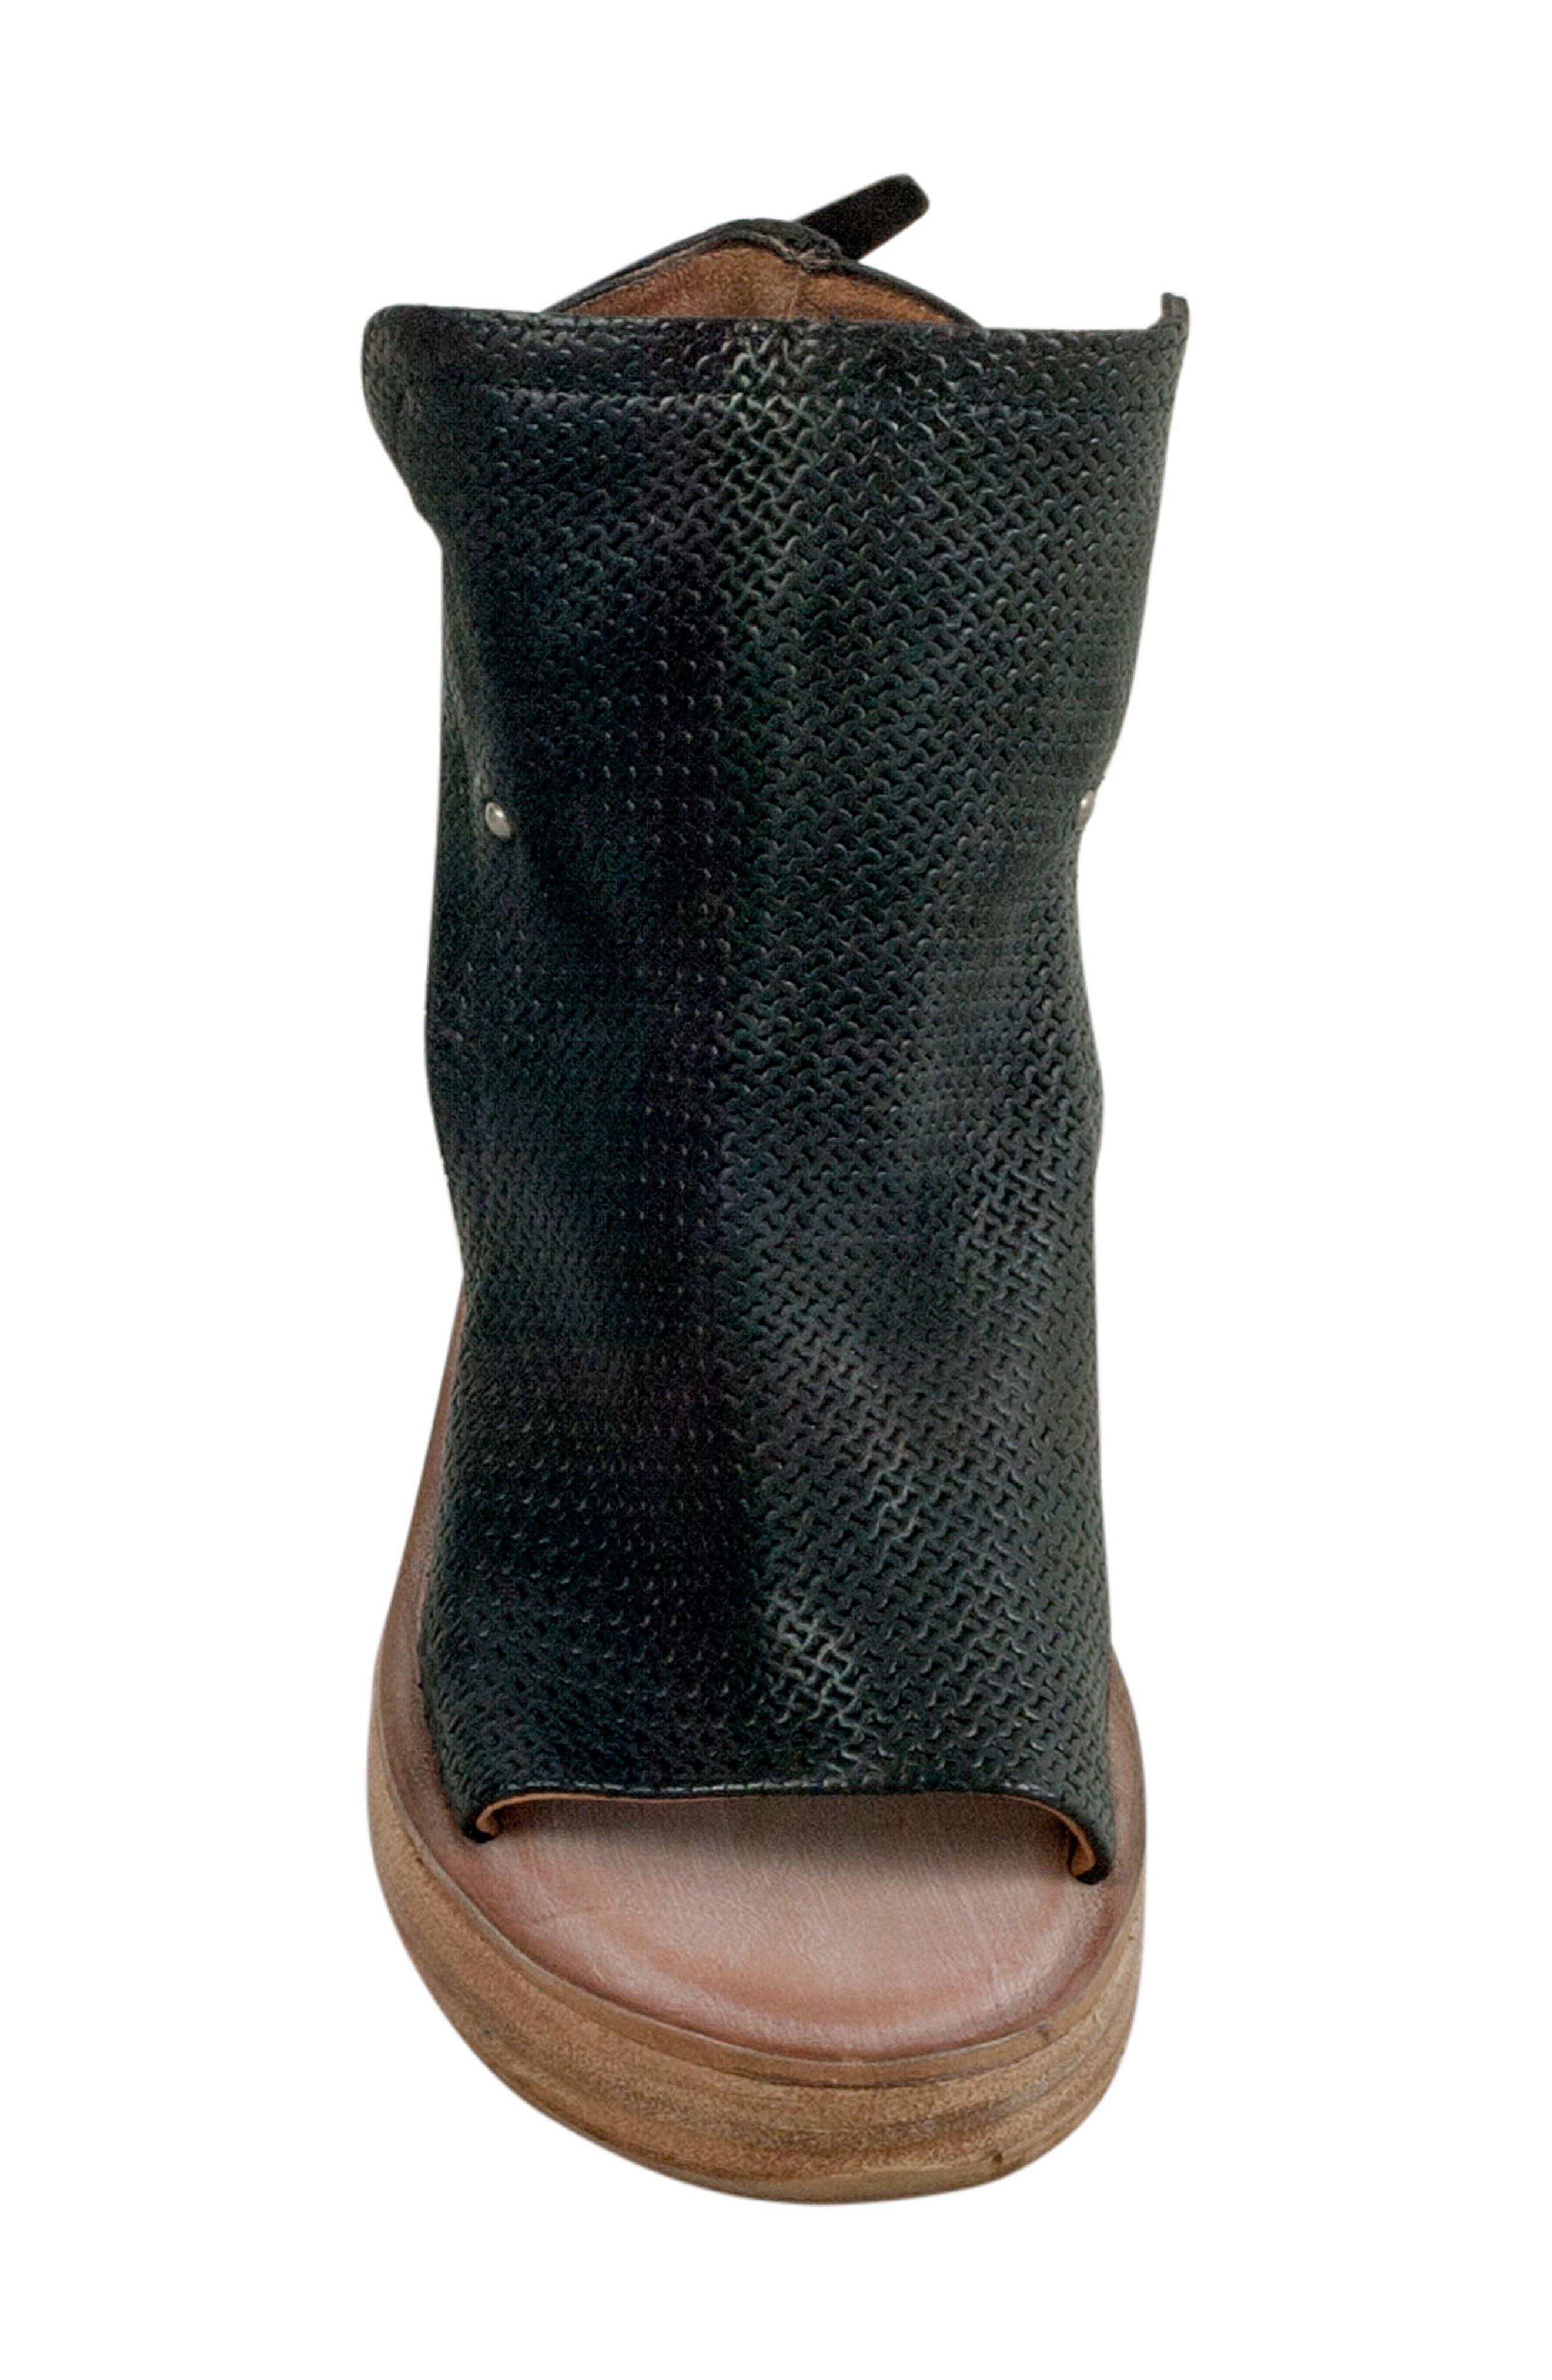 Nathan Platform Wedge Sandal,                             Alternate thumbnail 5, color,                             Black